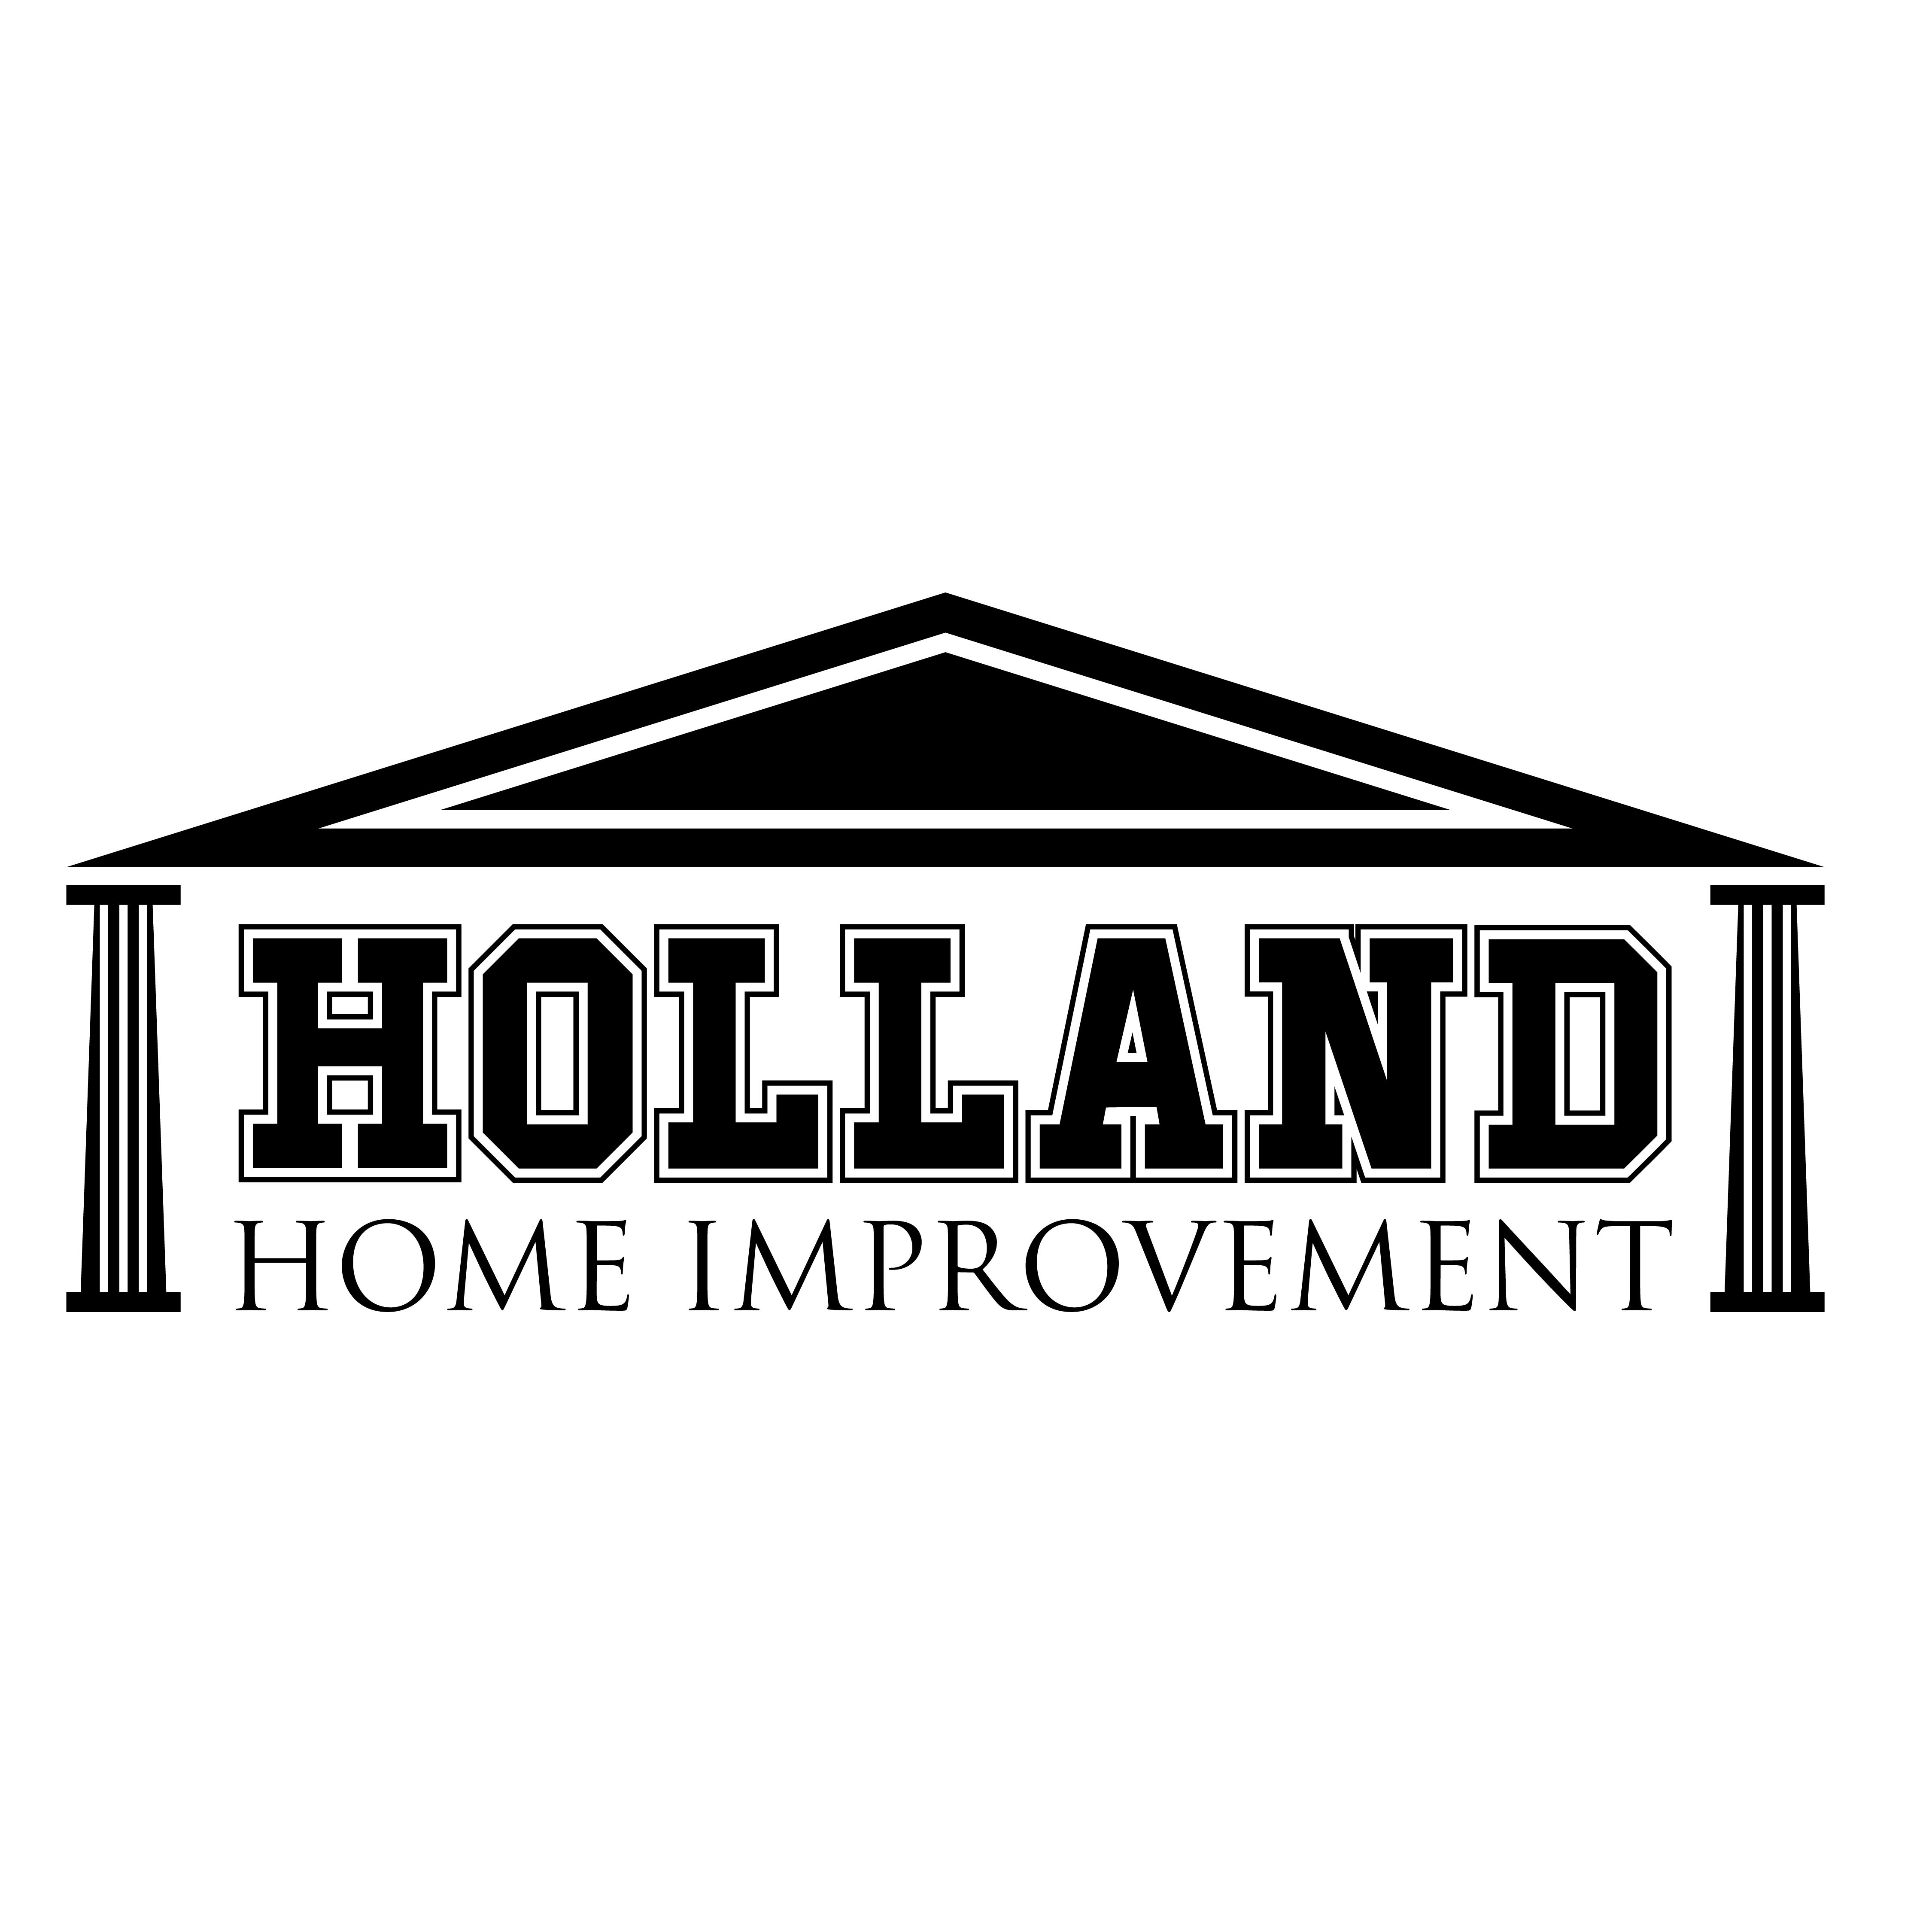 Holland Home Improvement